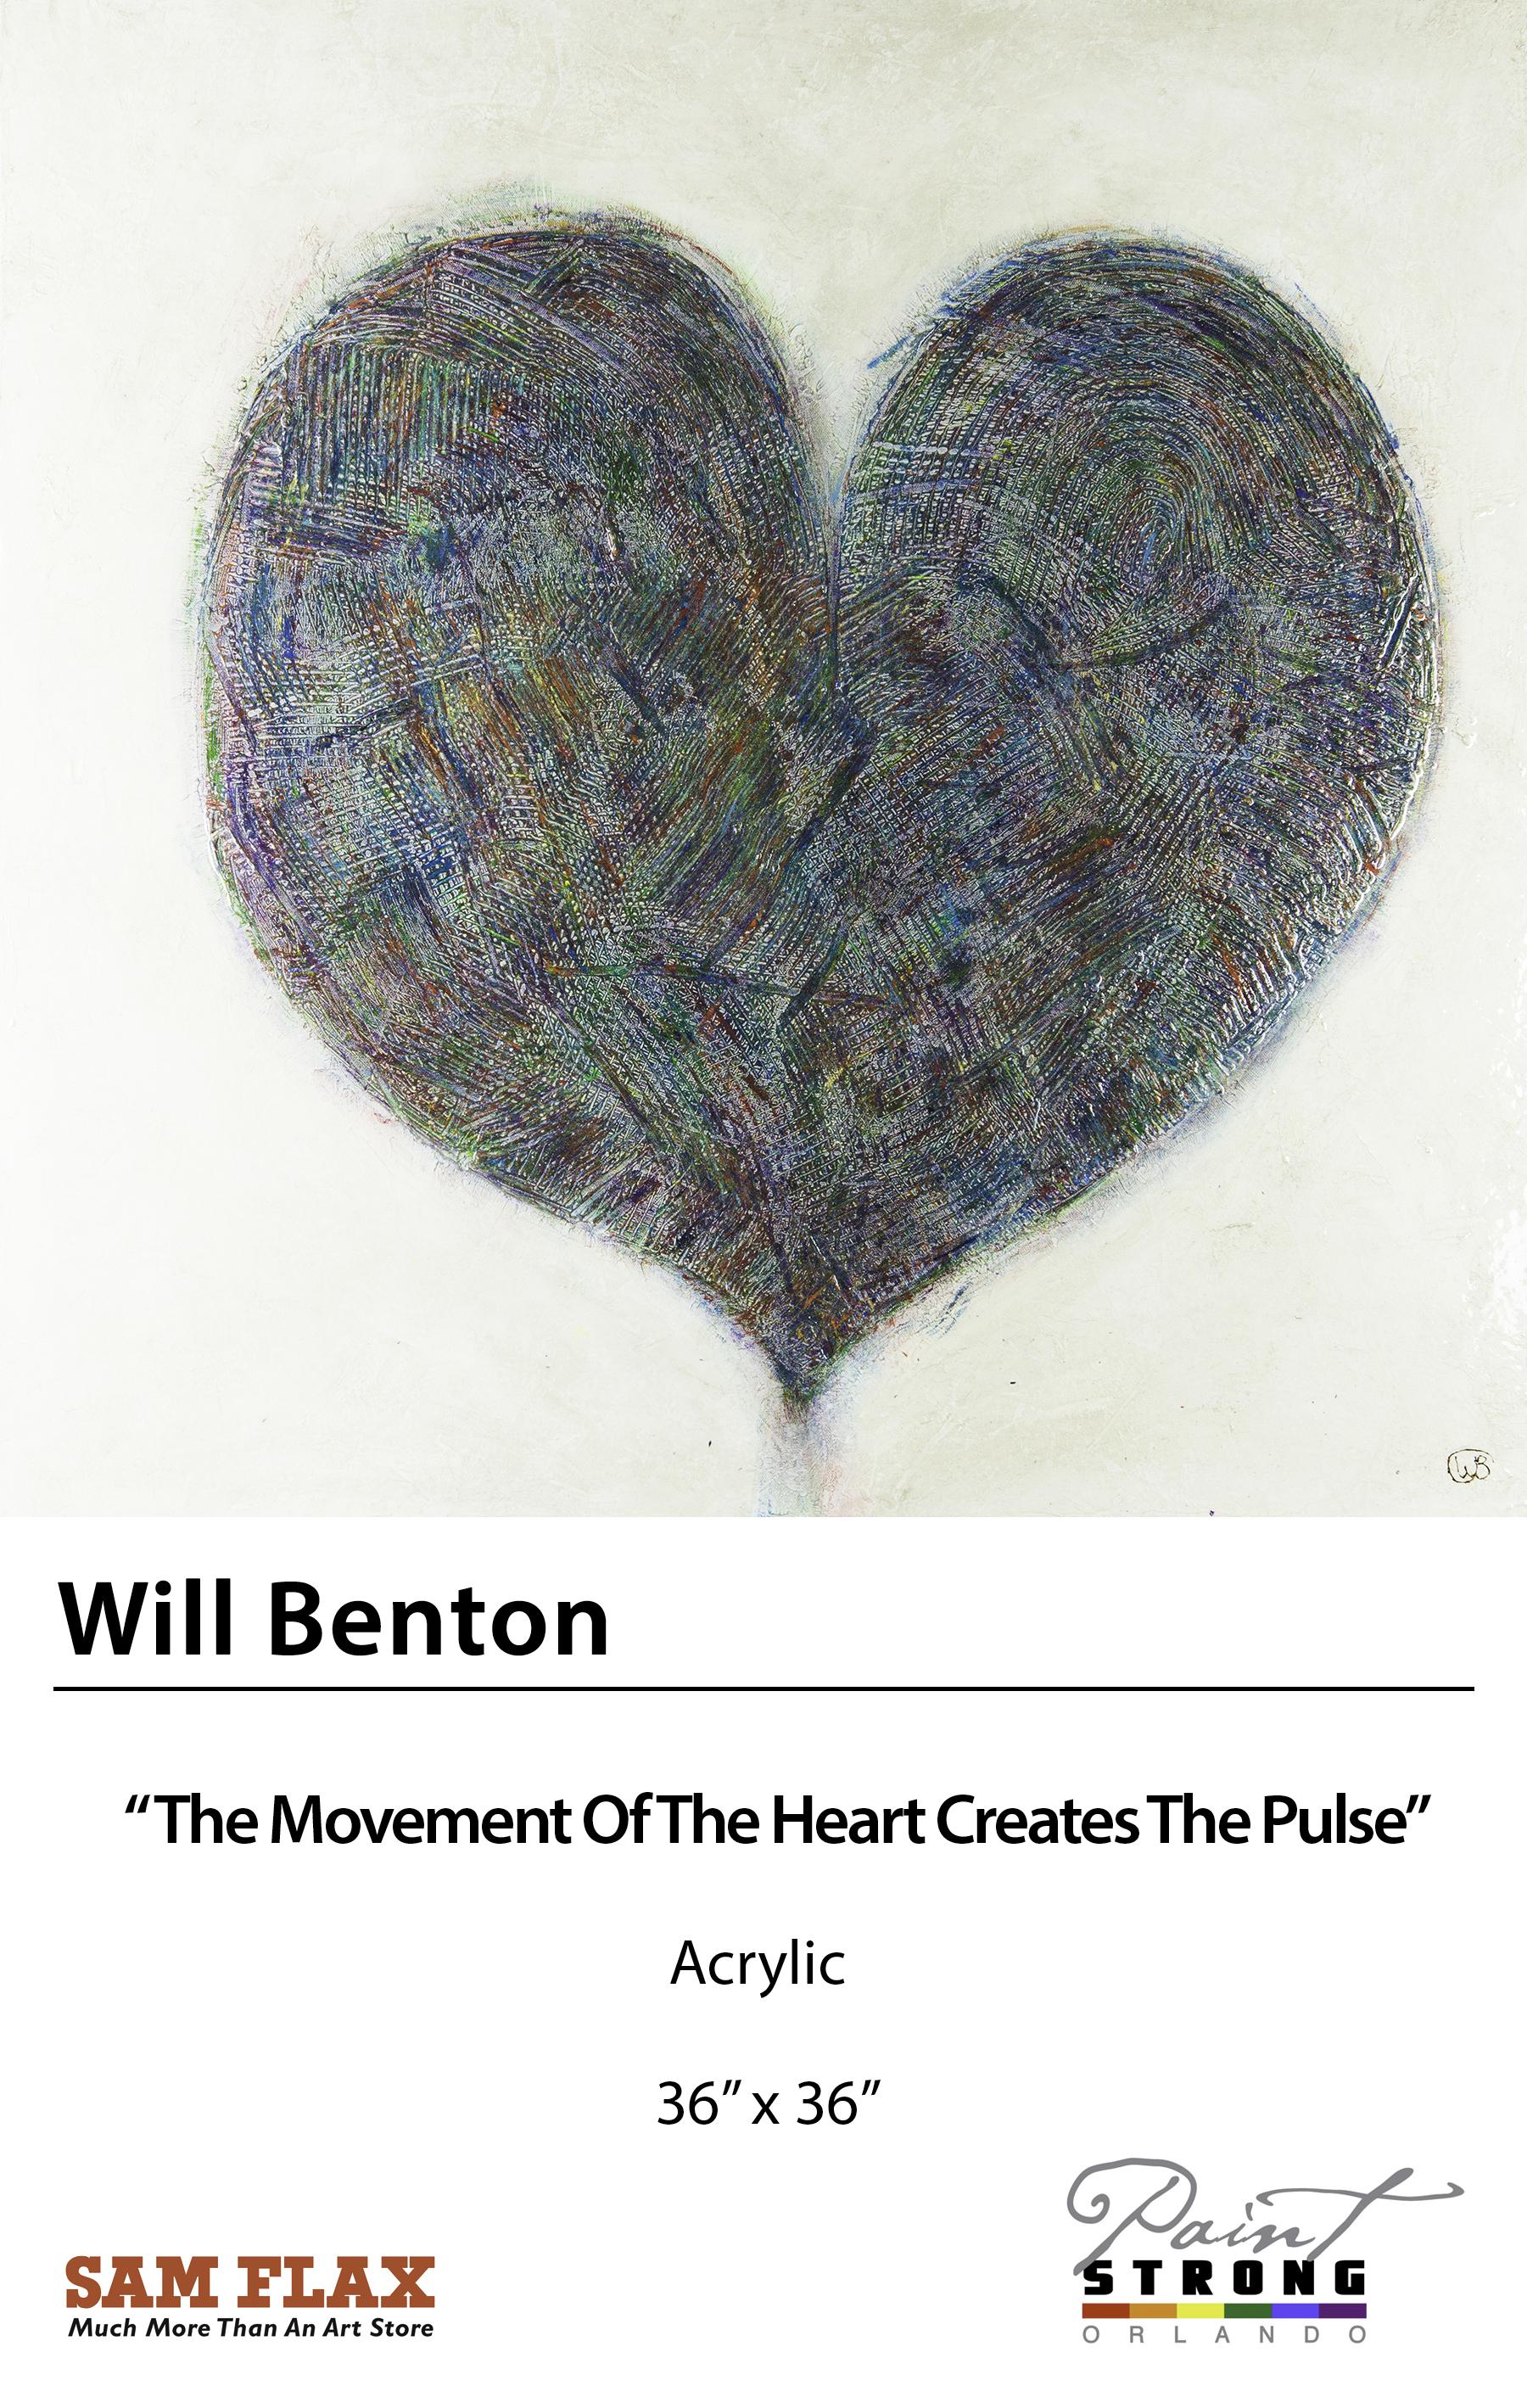 Will Benton